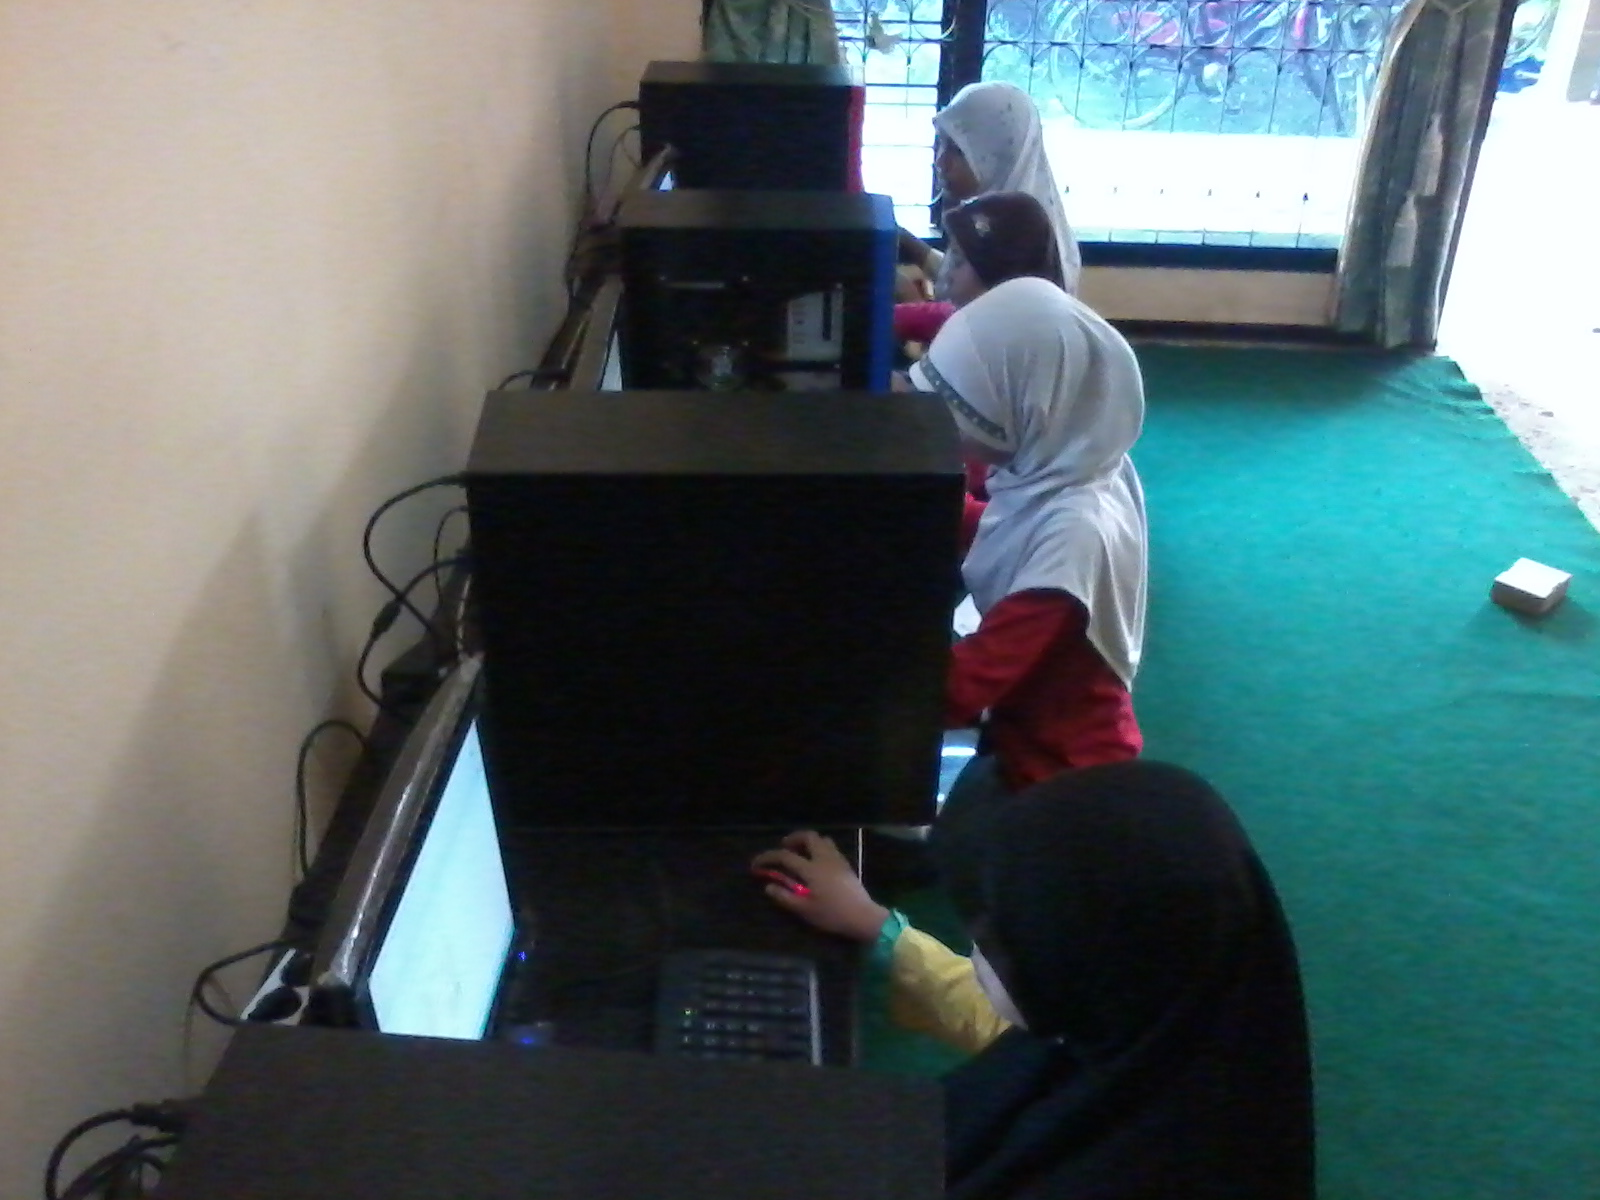 Kisah Membuka Usaha Kursus Komputer Indahnya Berbagi